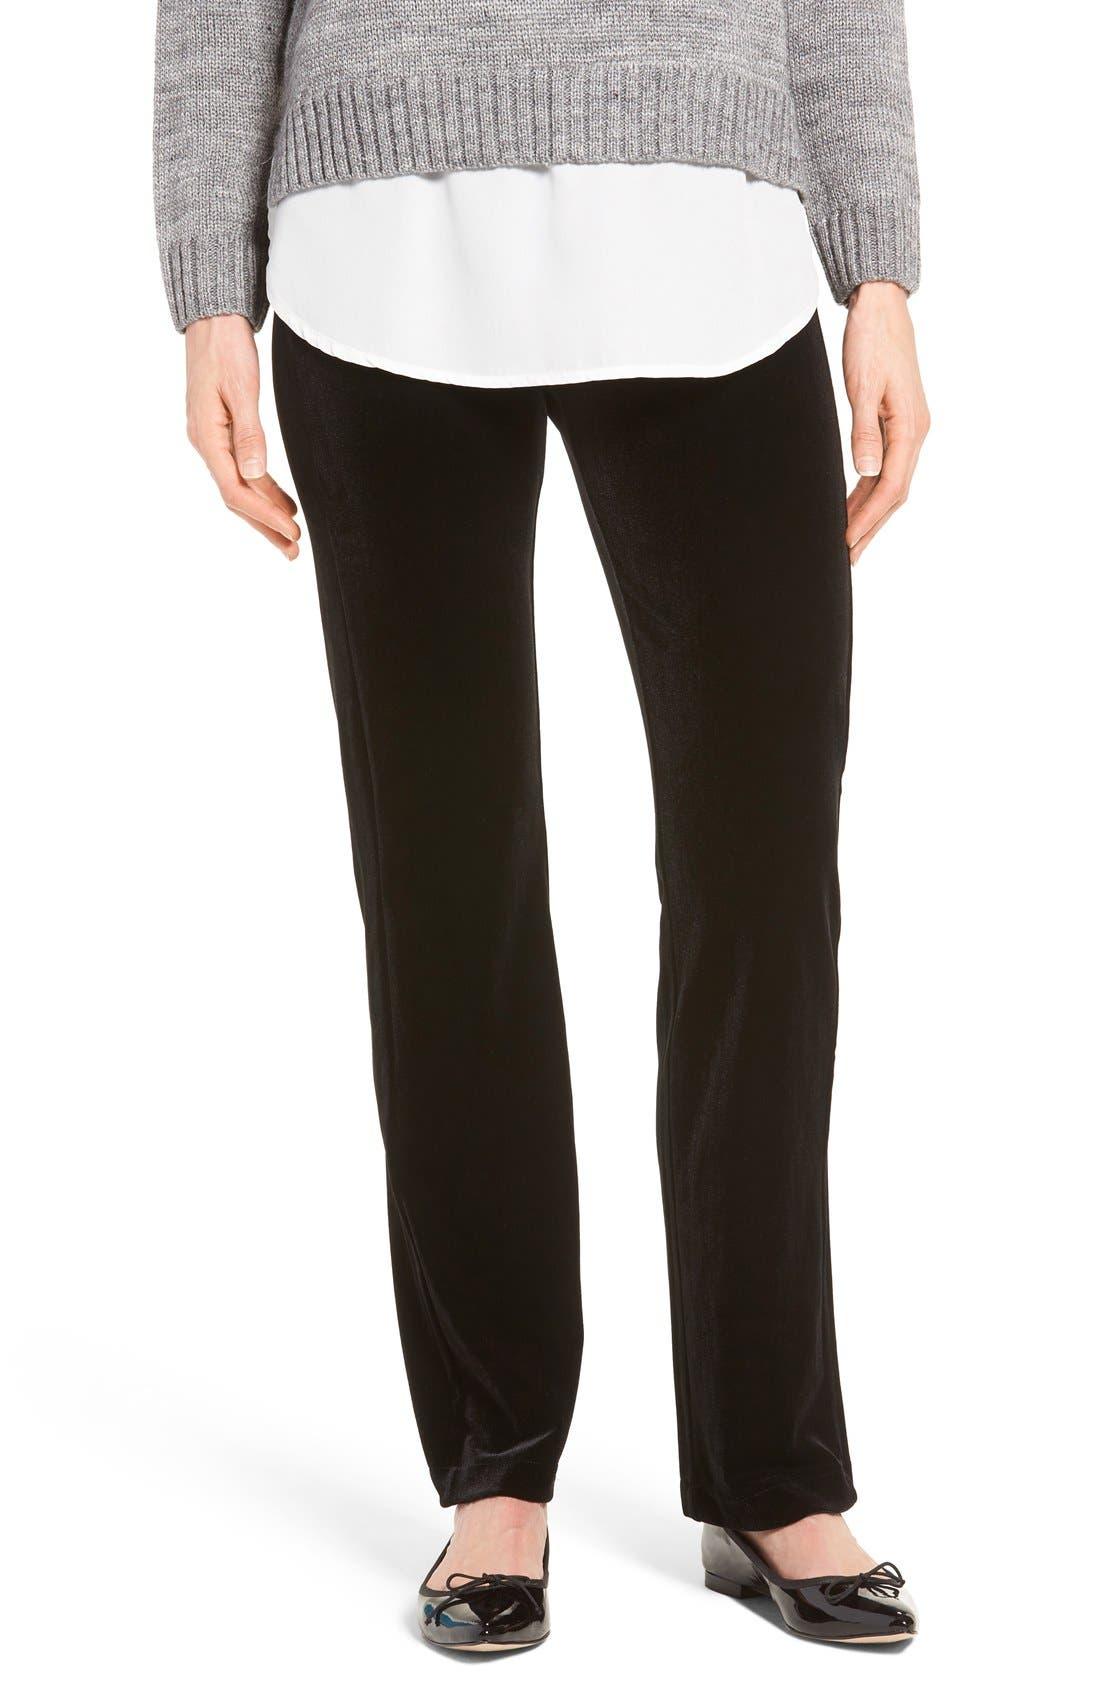 Alternate Image 1 Selected - Lyssé Velvet Pants